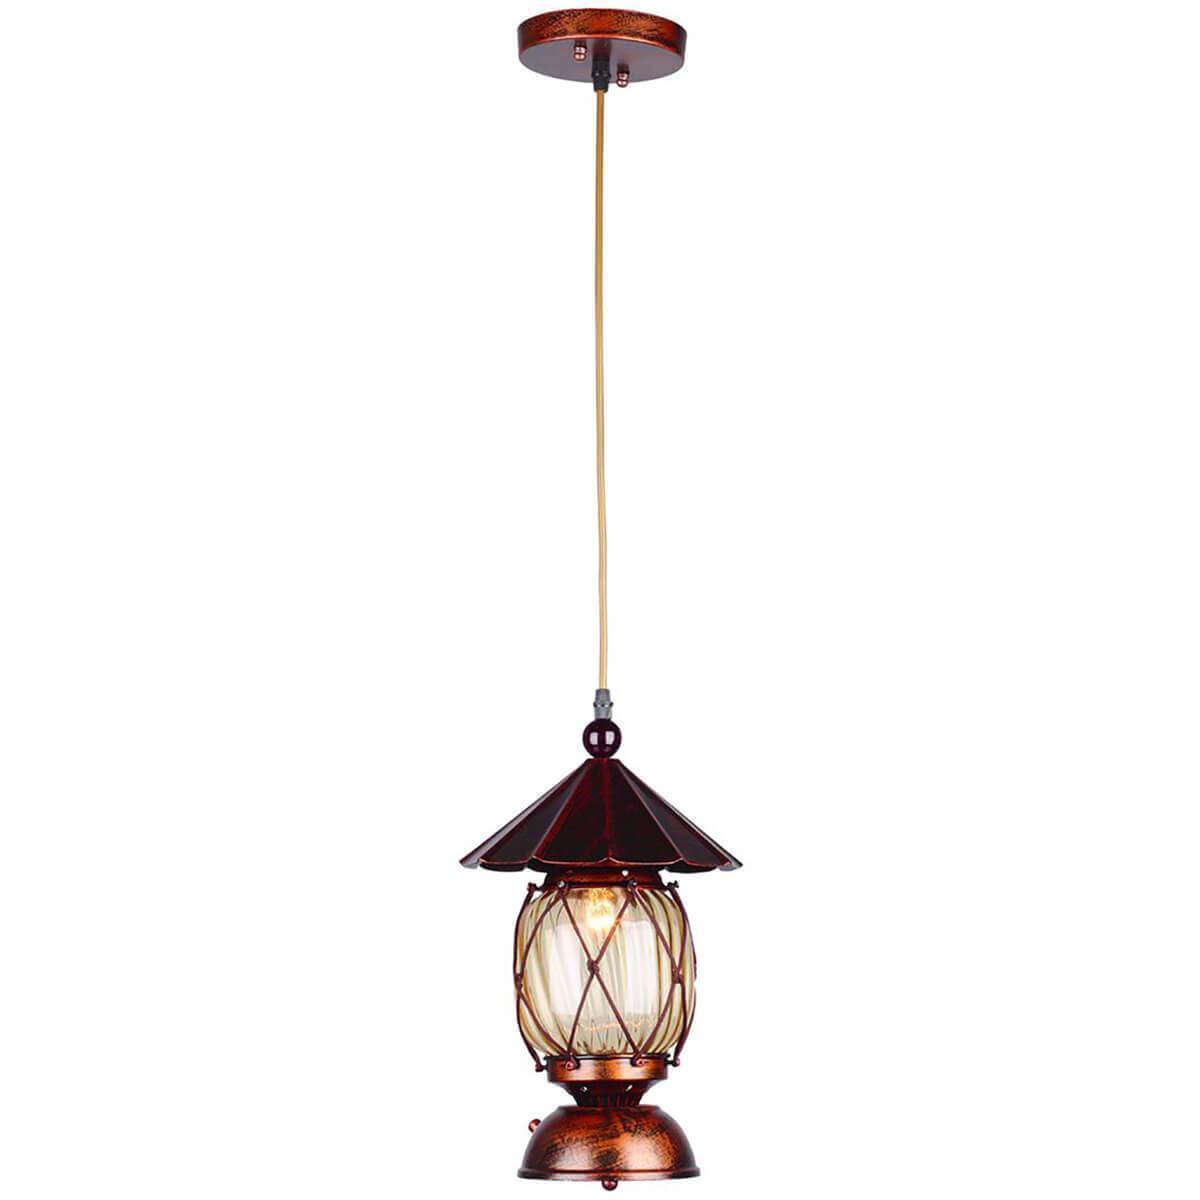 Подвесной светильник Omnilux OML-58306-01, E27, 40 Вт